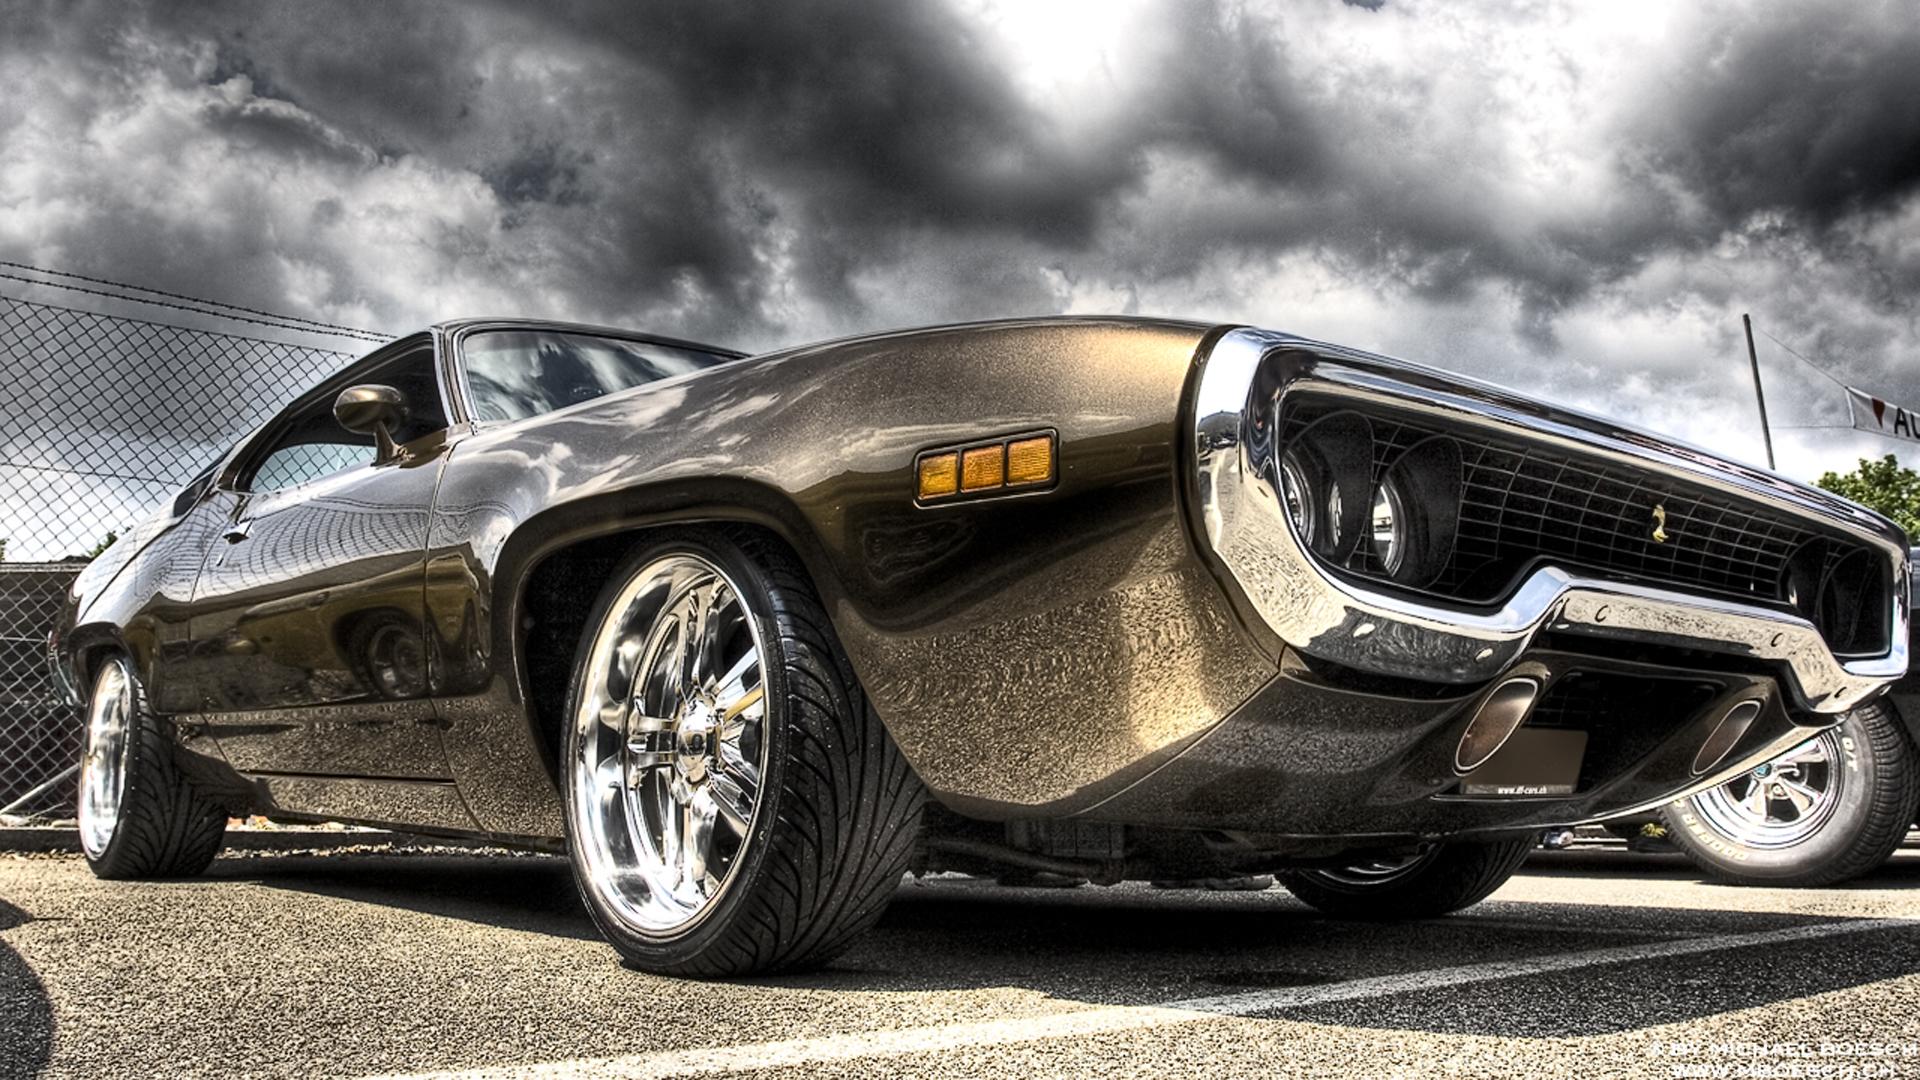 Download cars wallpapers hd full hd 1080p desktop backgrounds 1920x1080. Muscle Car Wallpaper American Muscle S 1920x1080 Download Hd Wallpaper Wallpapertip